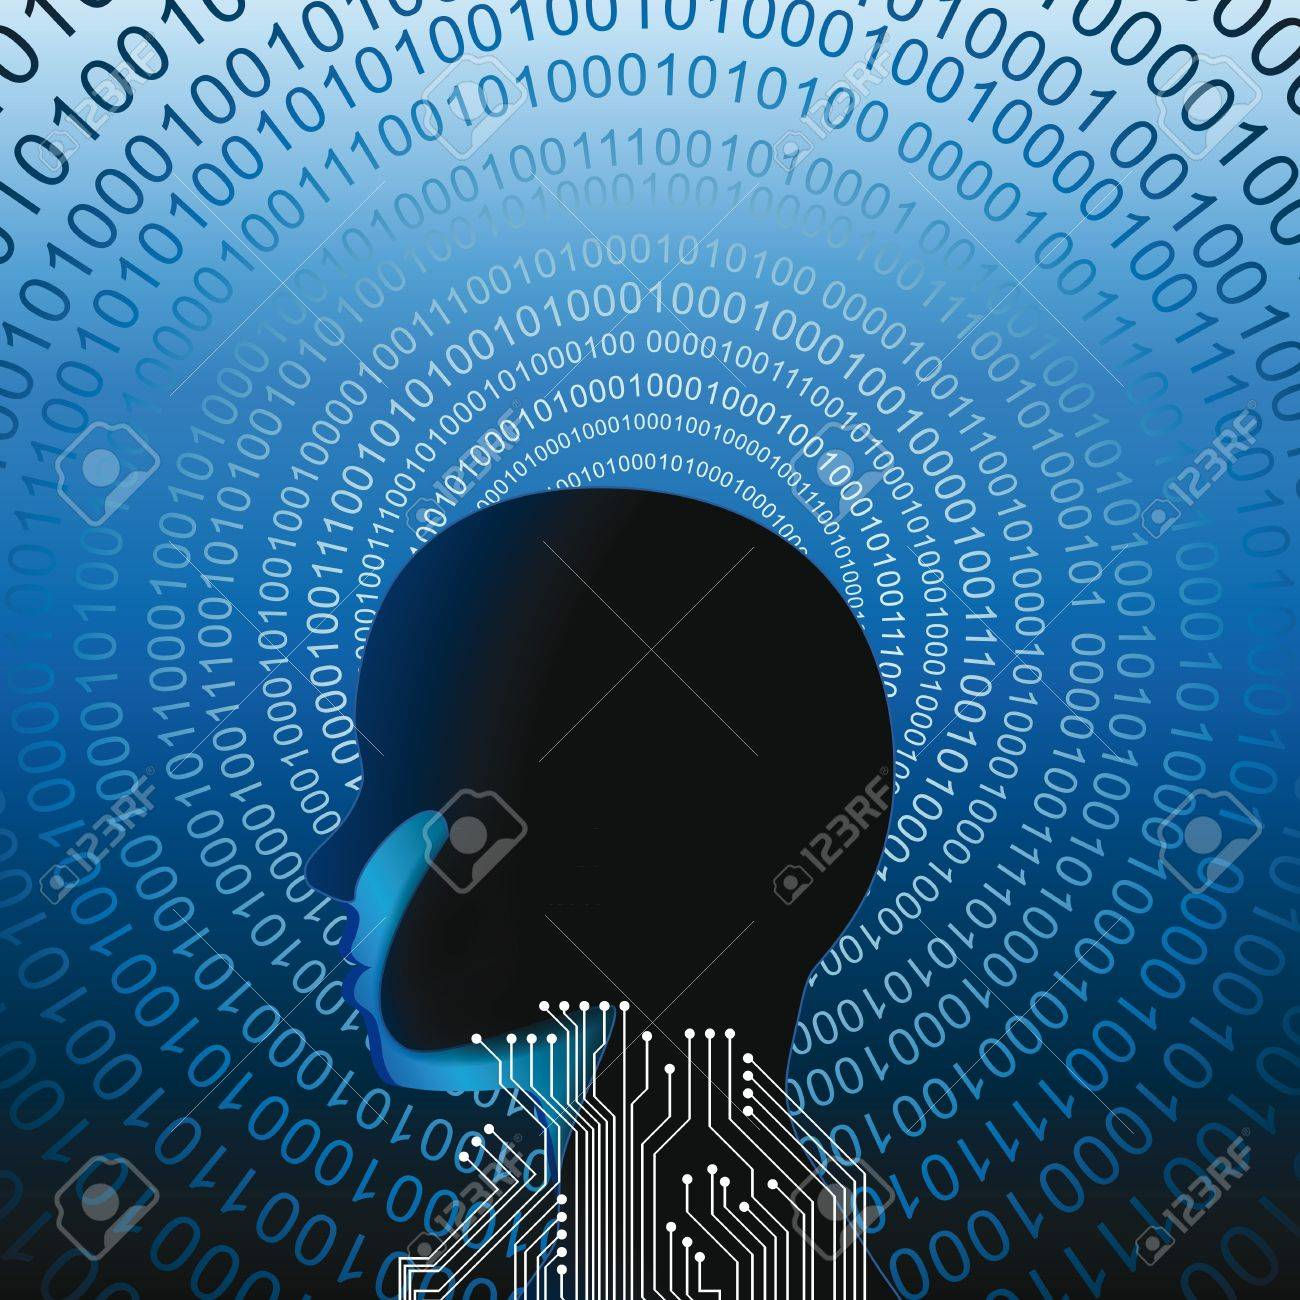 Abstarct human head with many binnary codes Stock Vector - 14594153